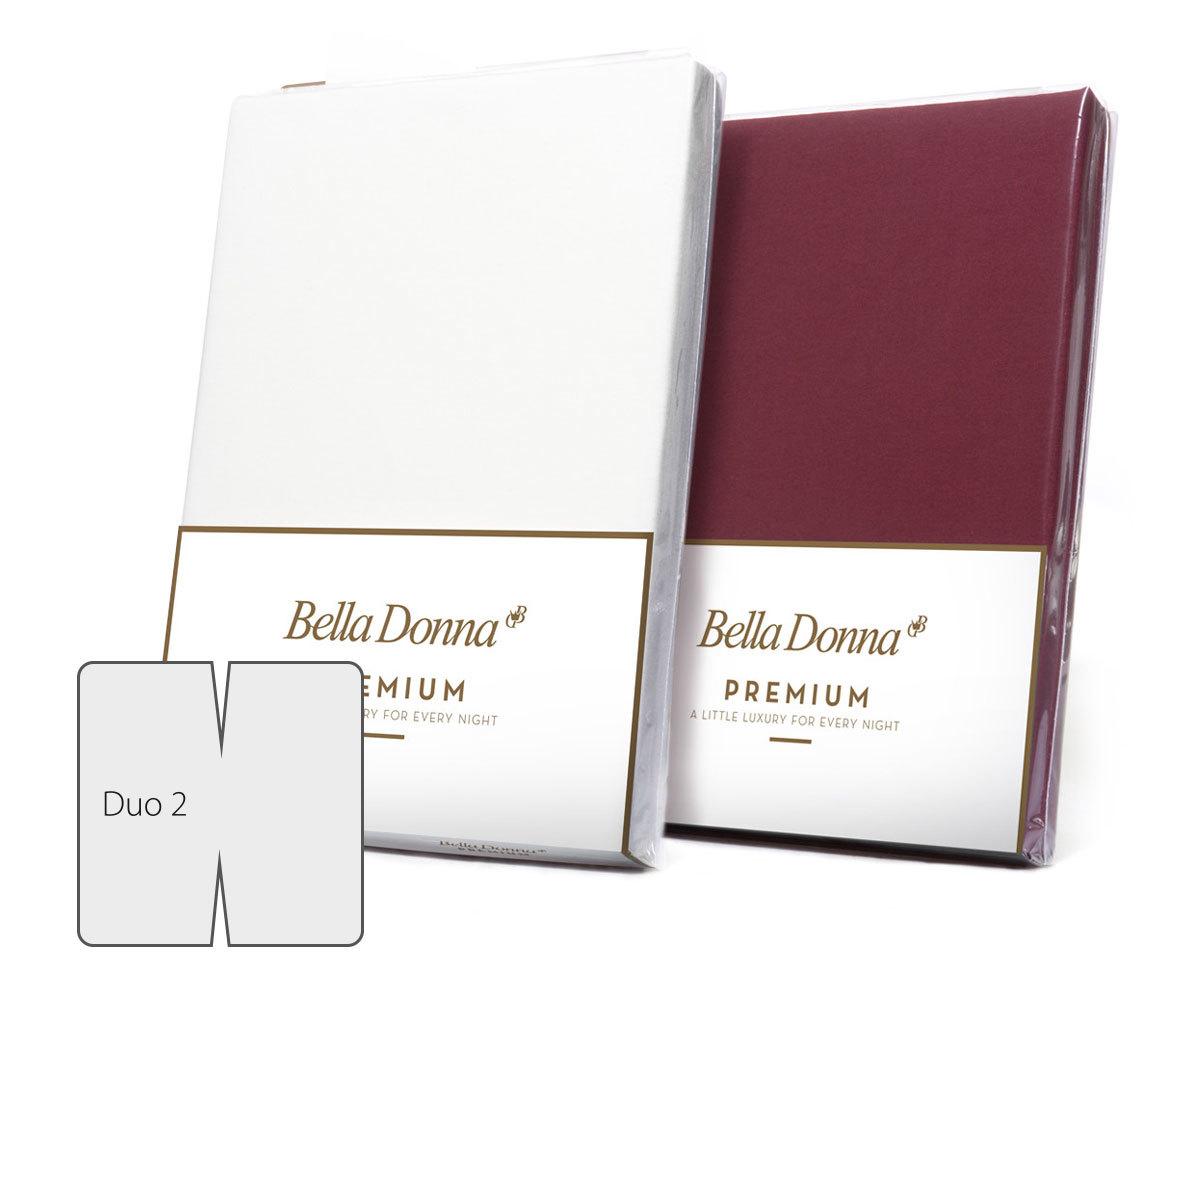 formesse boxspring split spannbetttuch bella donna premium. Black Bedroom Furniture Sets. Home Design Ideas